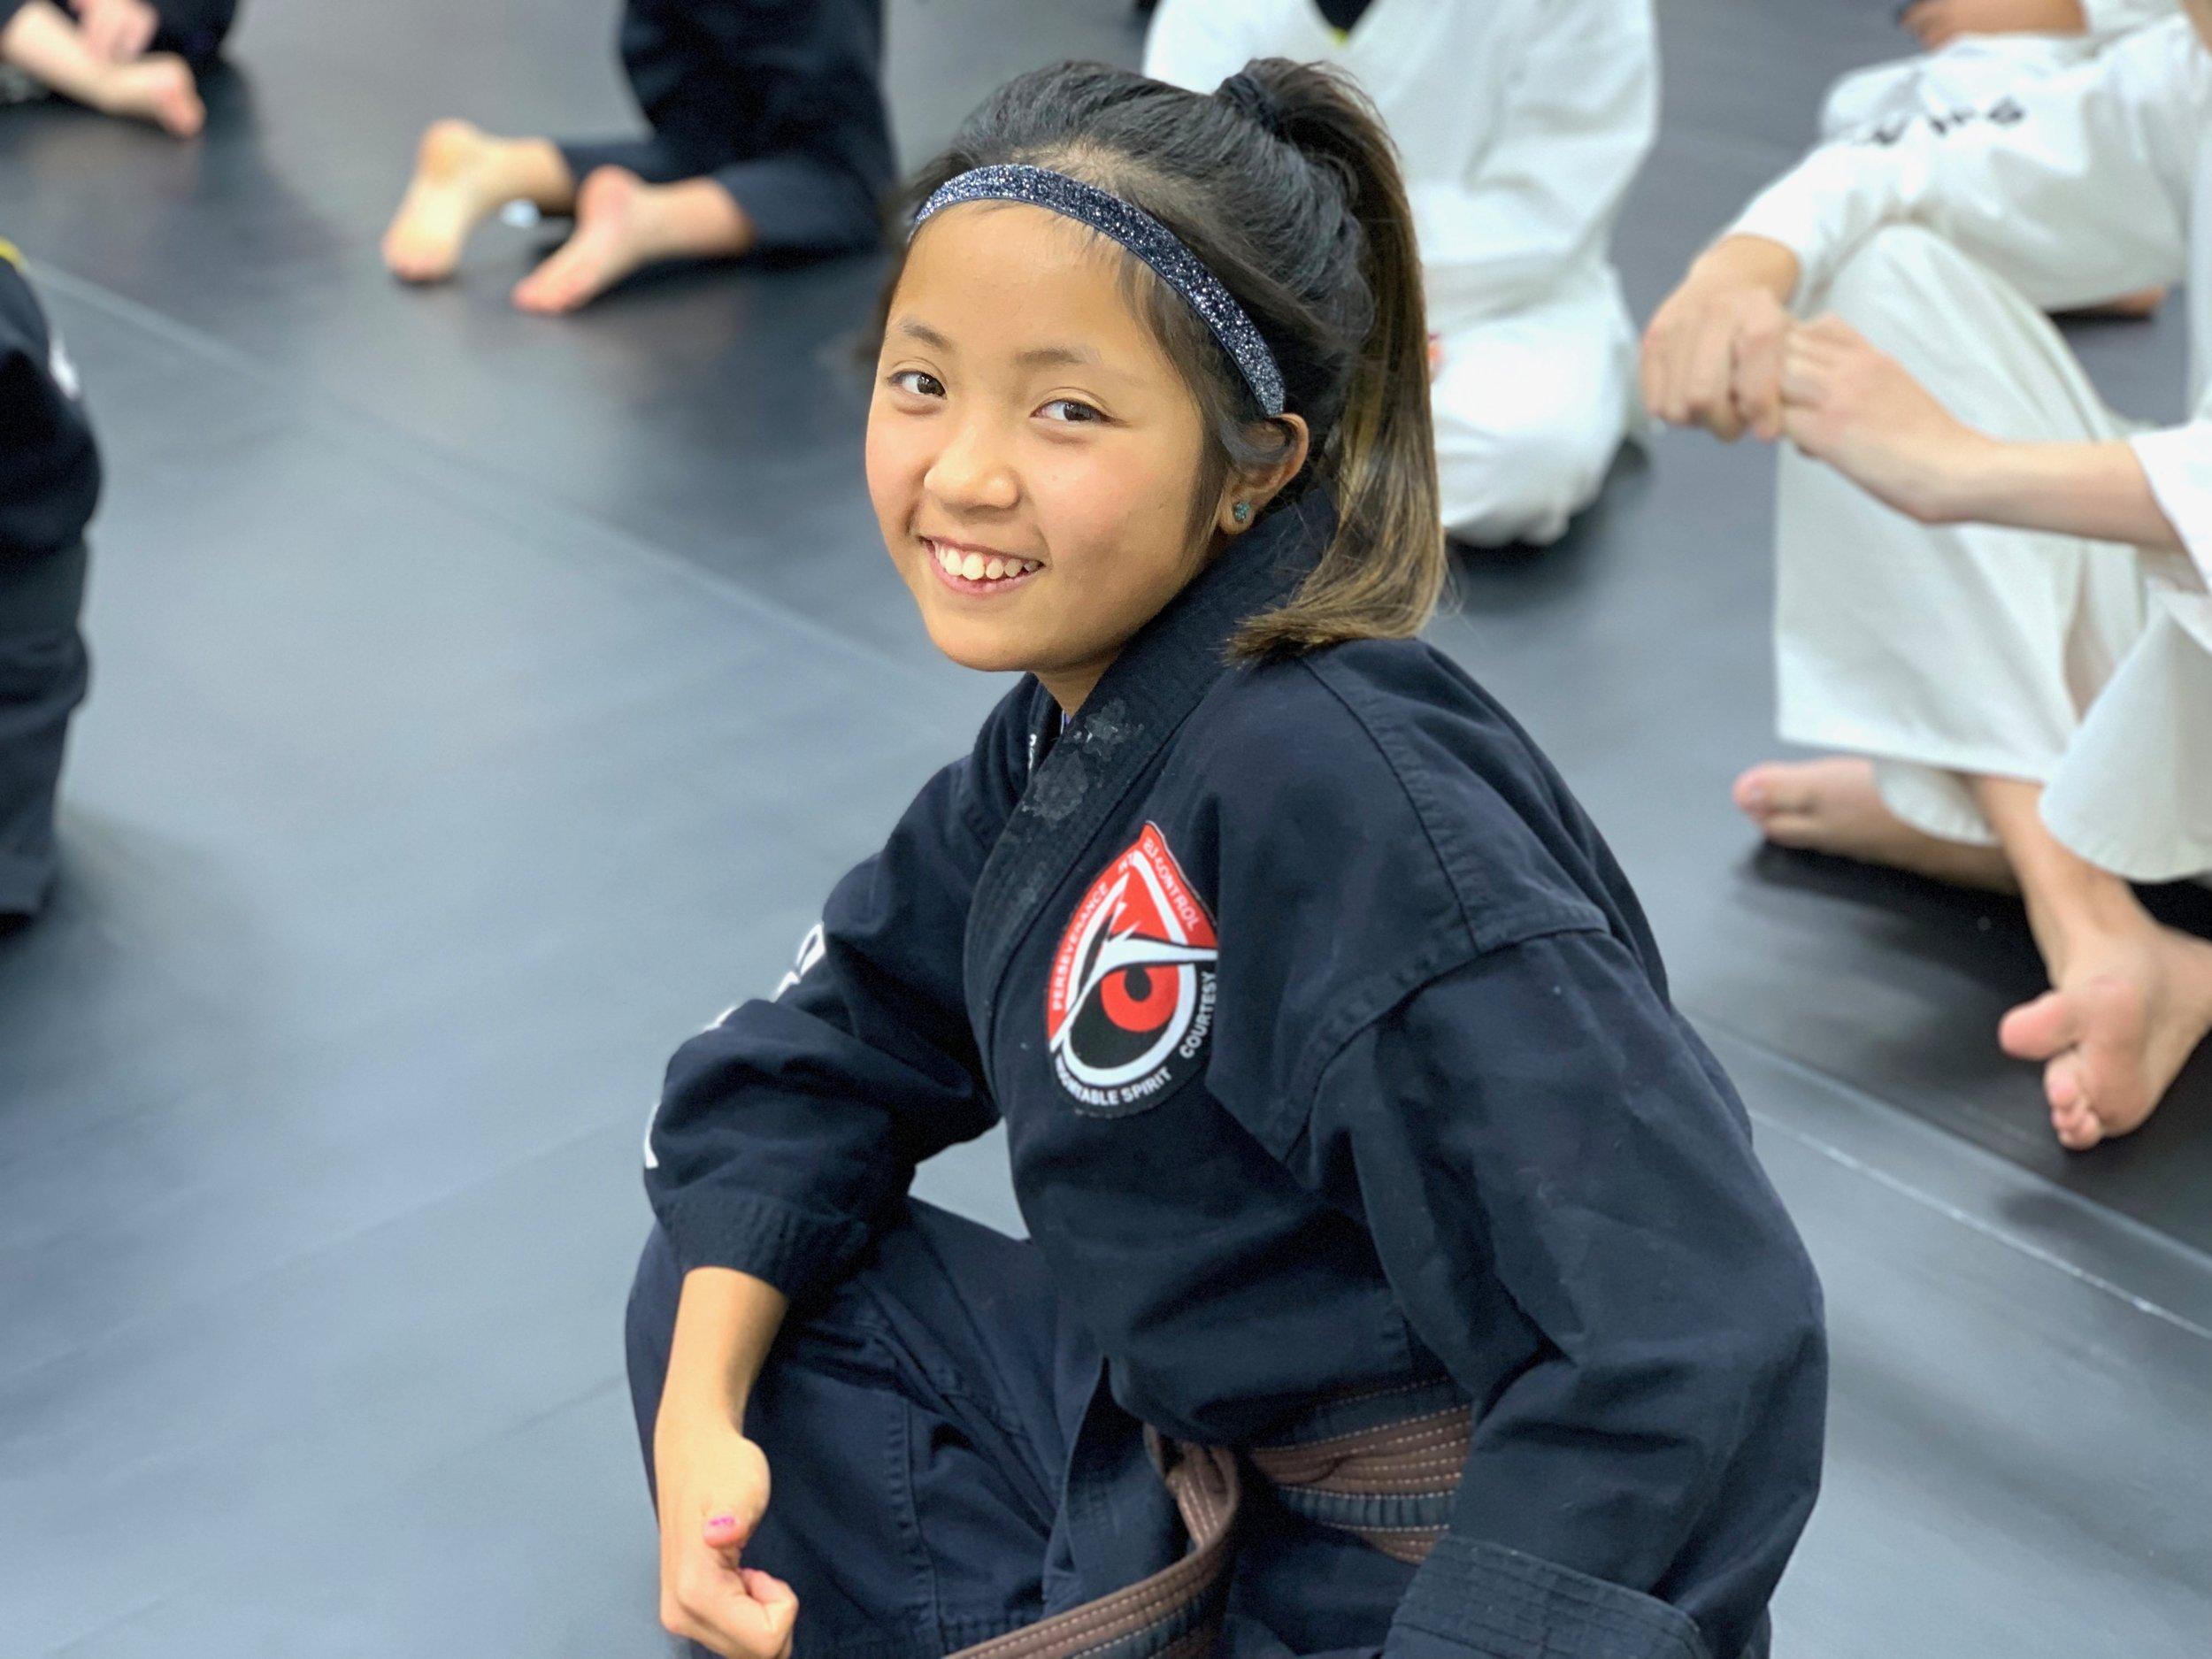 karate-kids-program-souhtlake-keller-grapevine-texas00038.jpeg